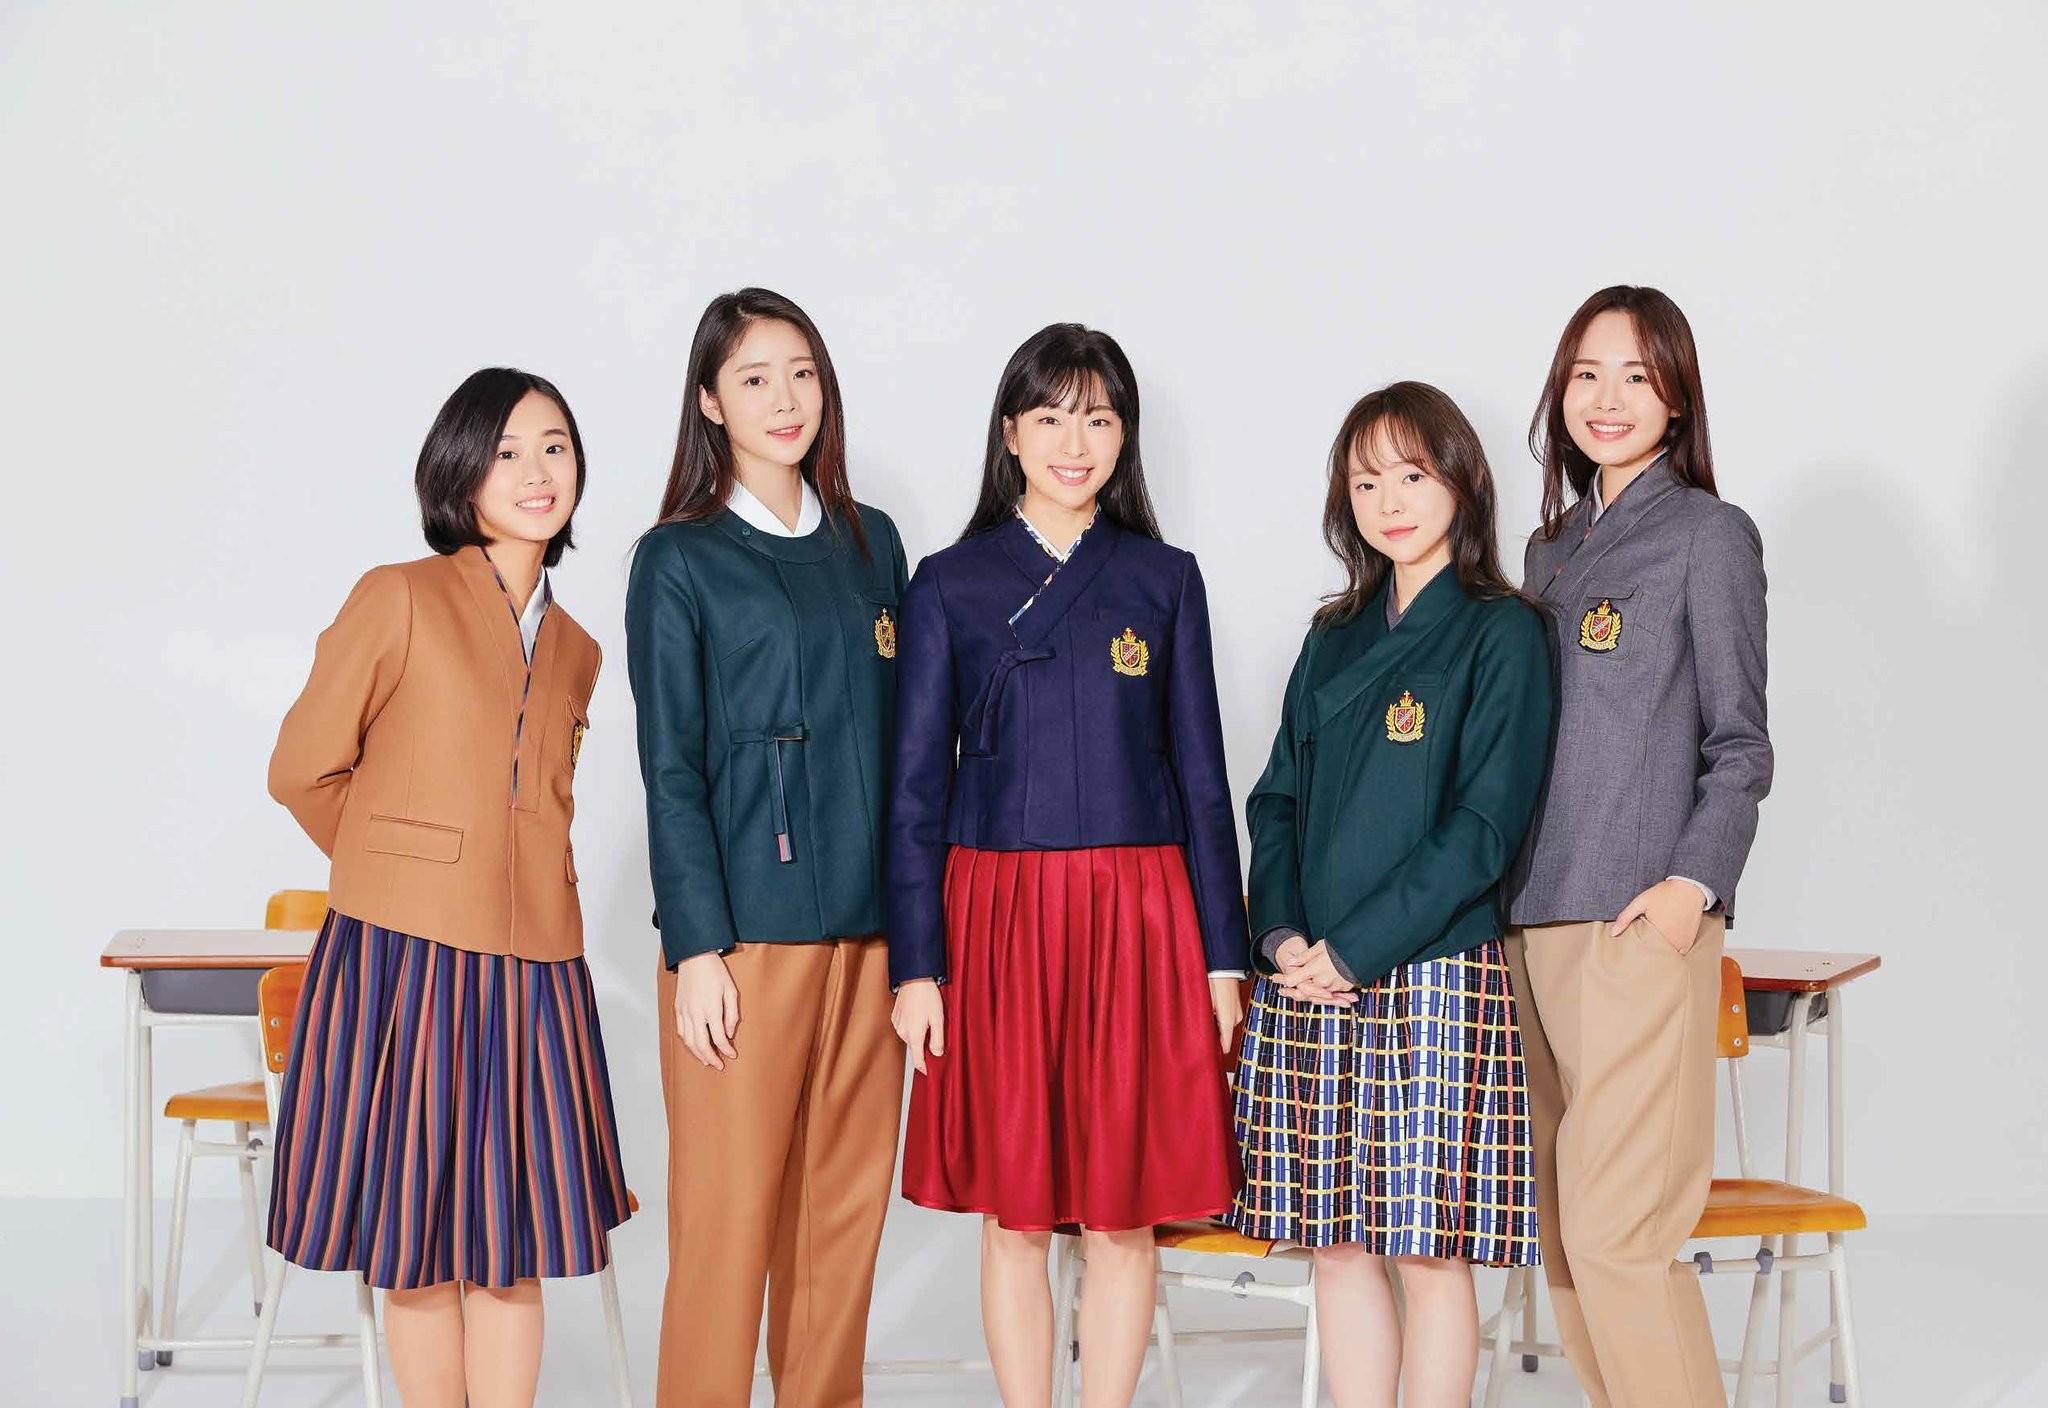 ▲▼韓國制服。(圖/翻攝自Twitter/@vicekorea)